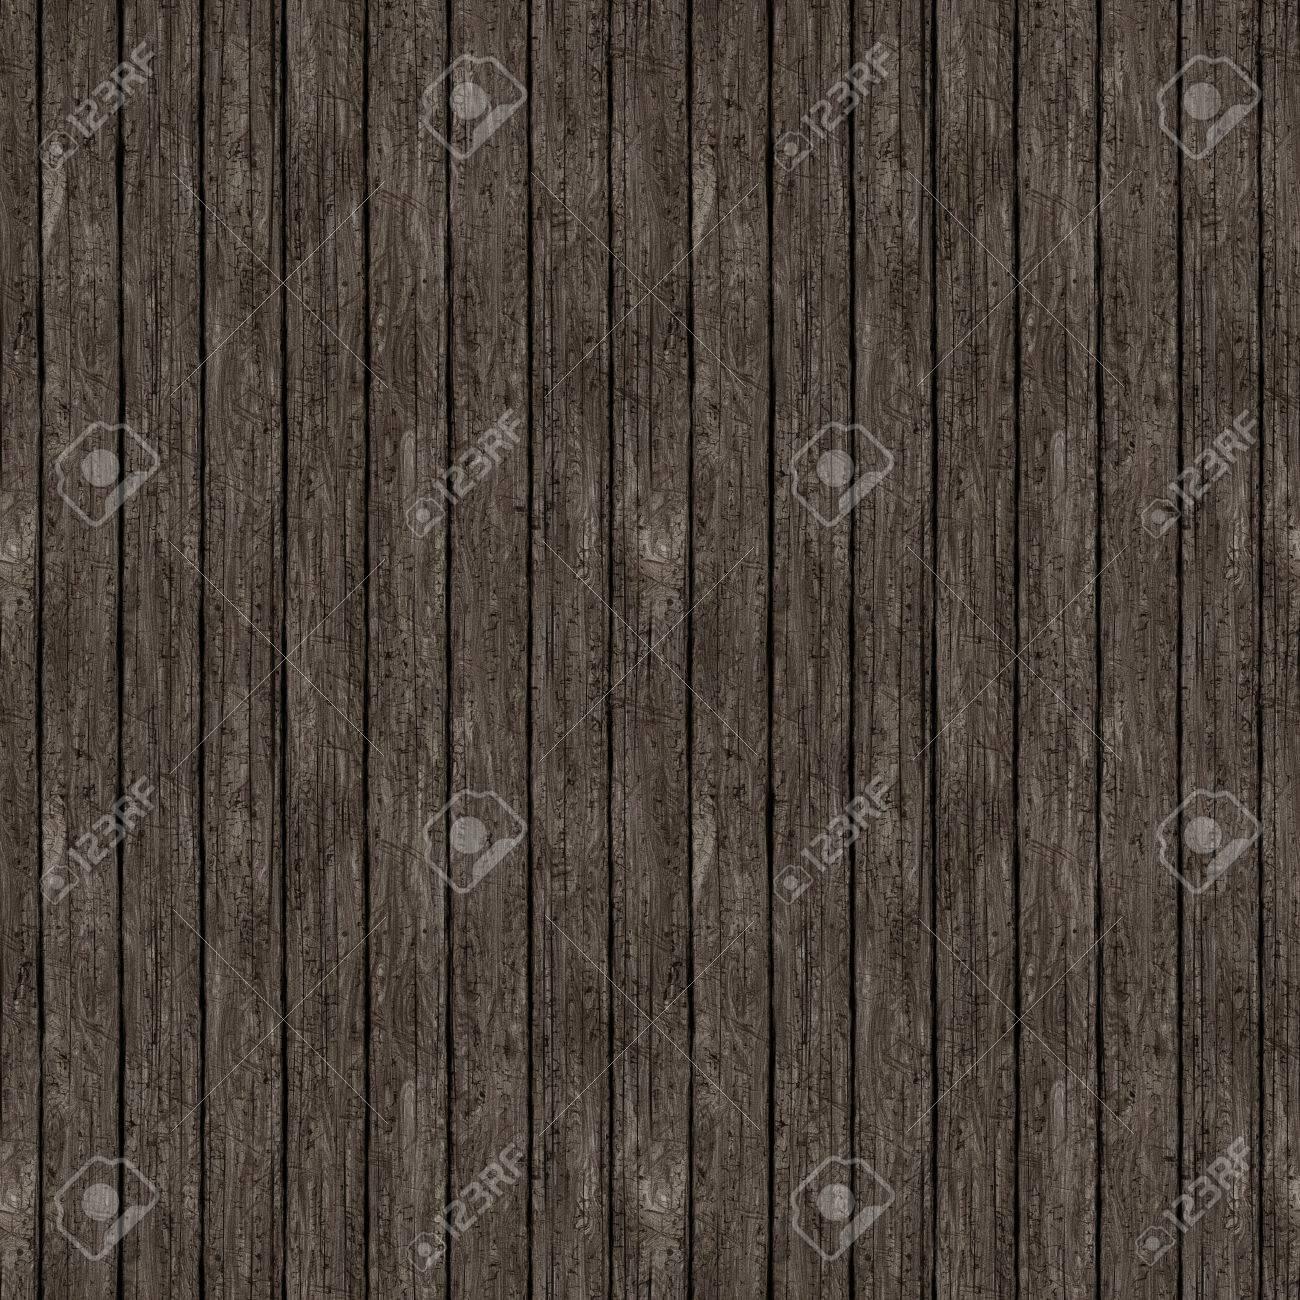 Reclaimed Wood Background Stock Photo - 24989612 - Reclaimed Wood Background Stock Photo, Picture And Royalty Free